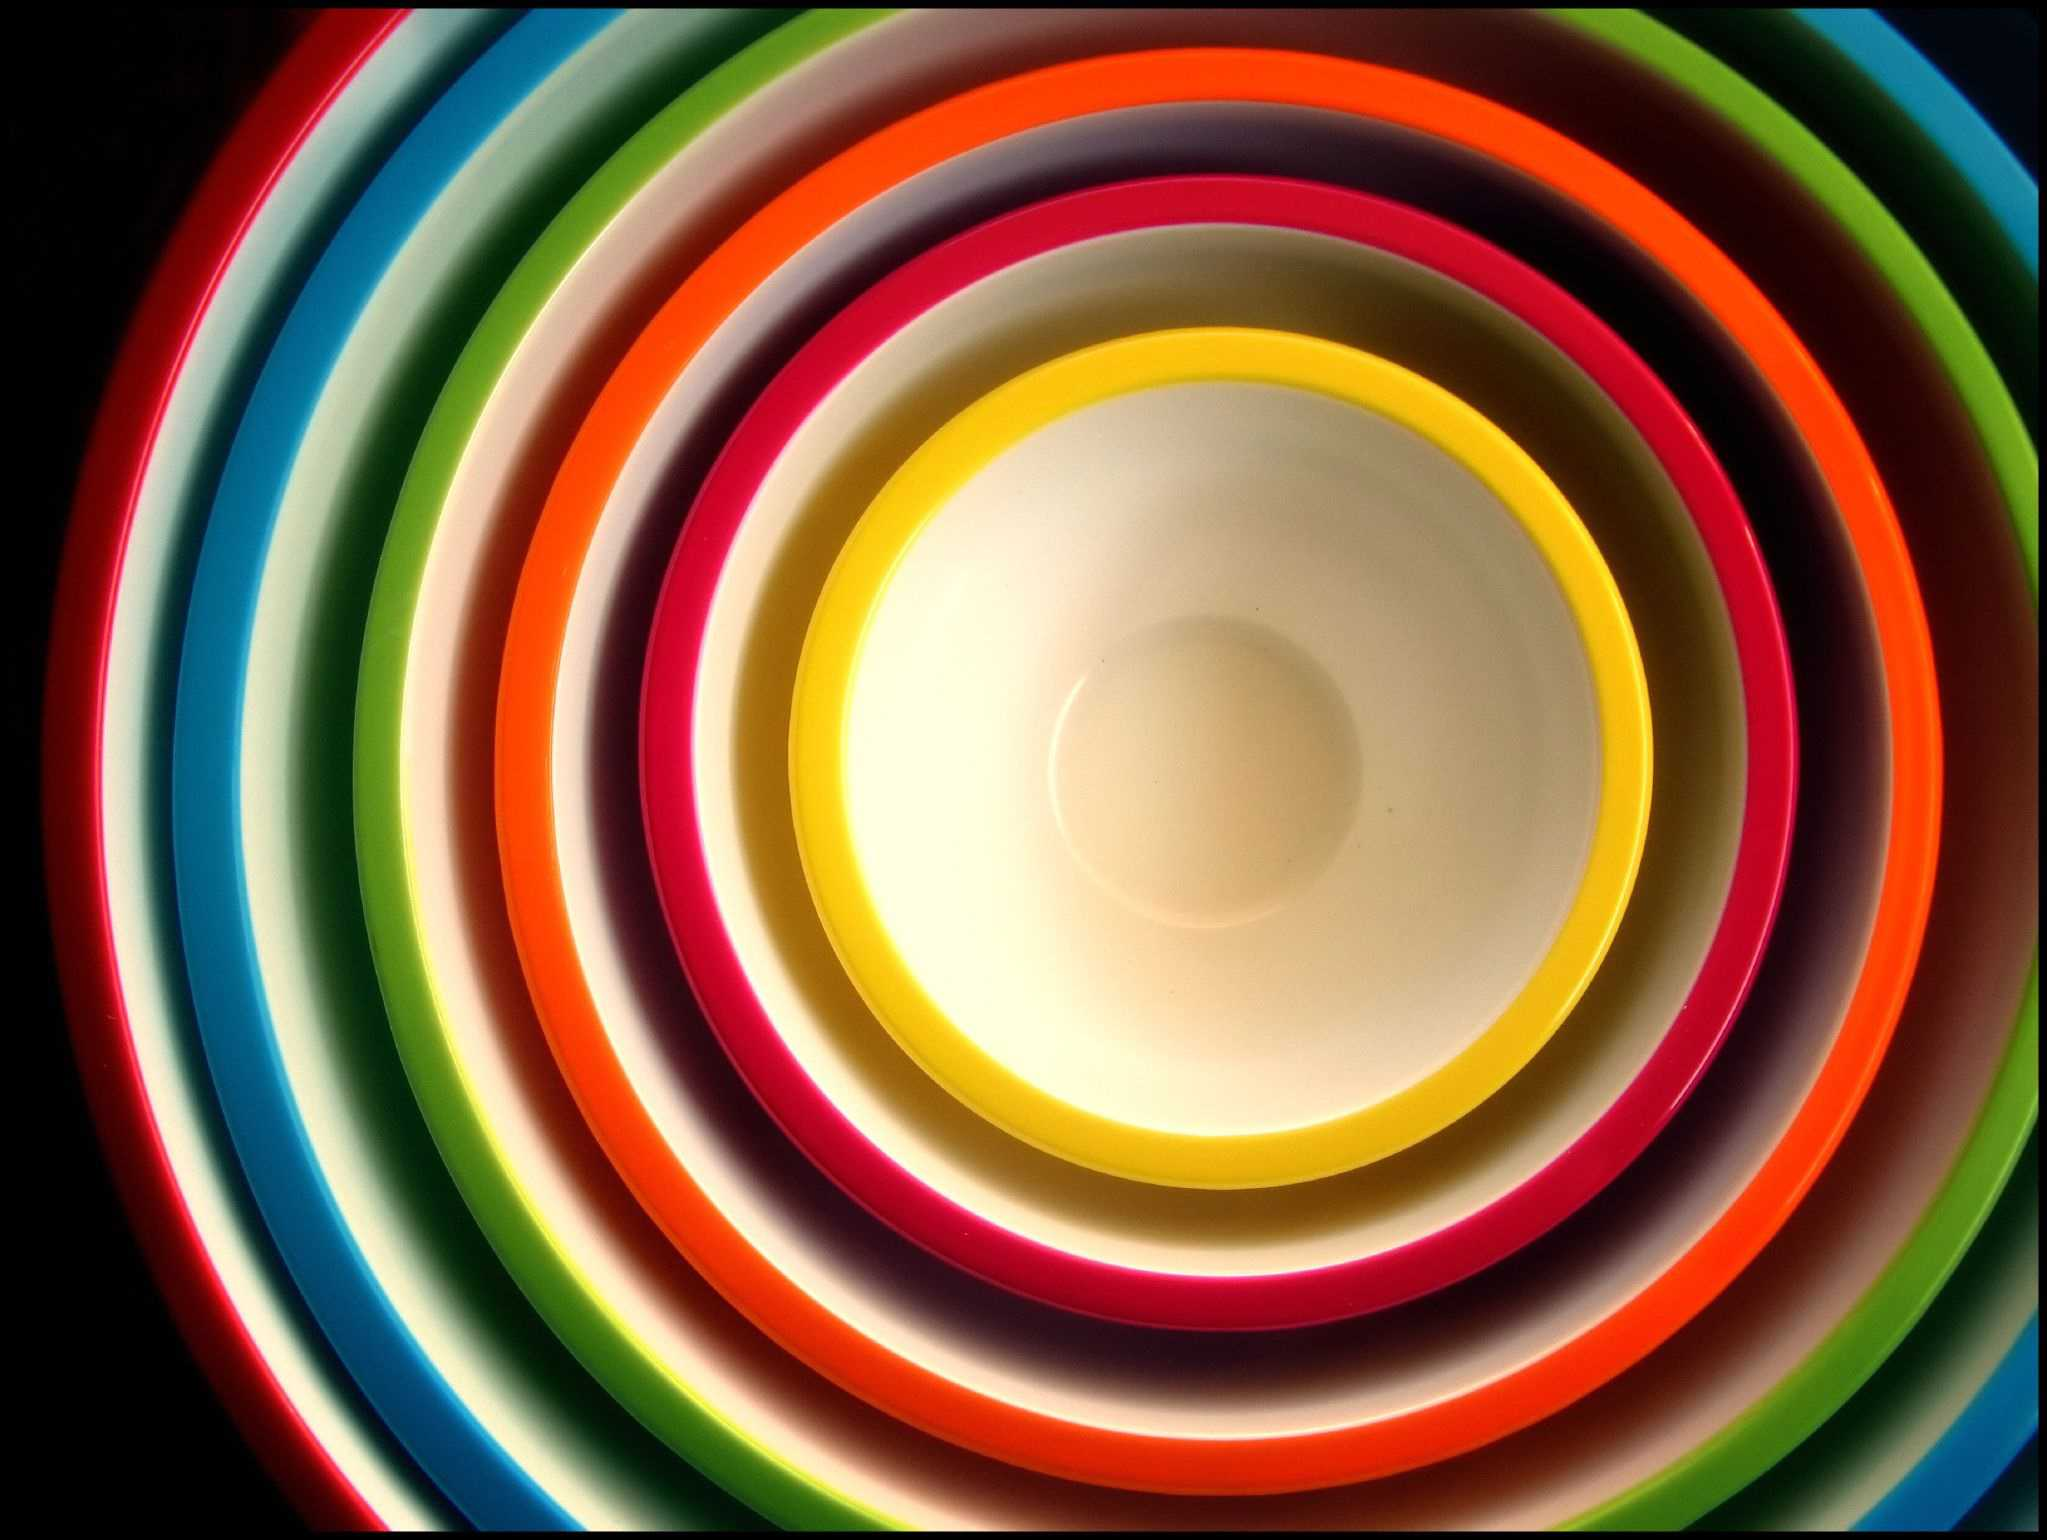 Concentric bowls